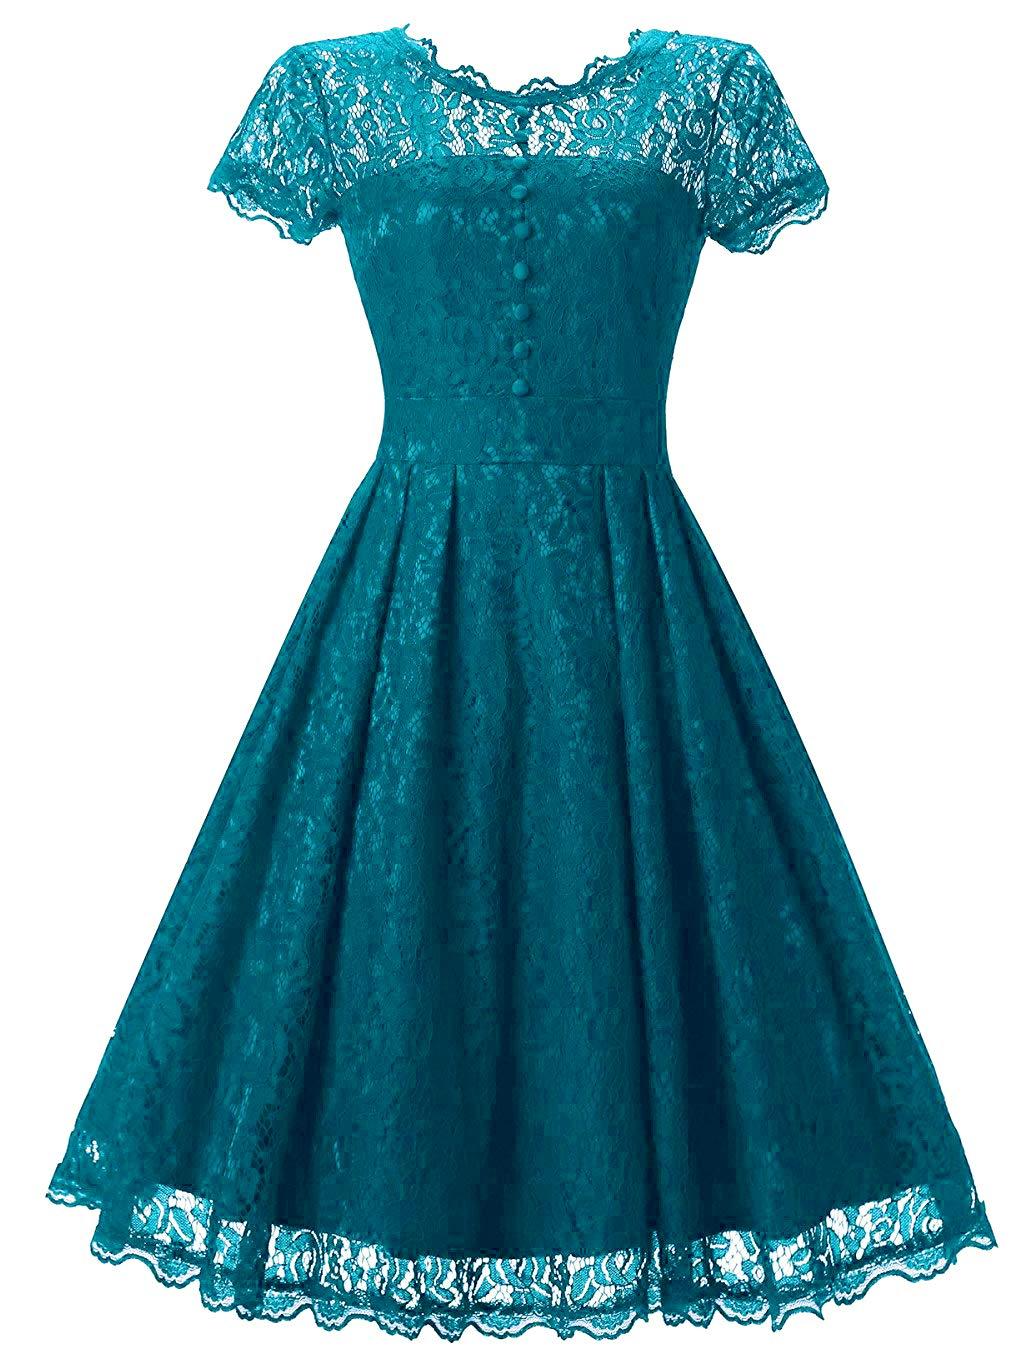 Available at Amazon: Tecrio Women Elegant Vintage Floral Lace Capshoulder Cocktail Party Swing Dress